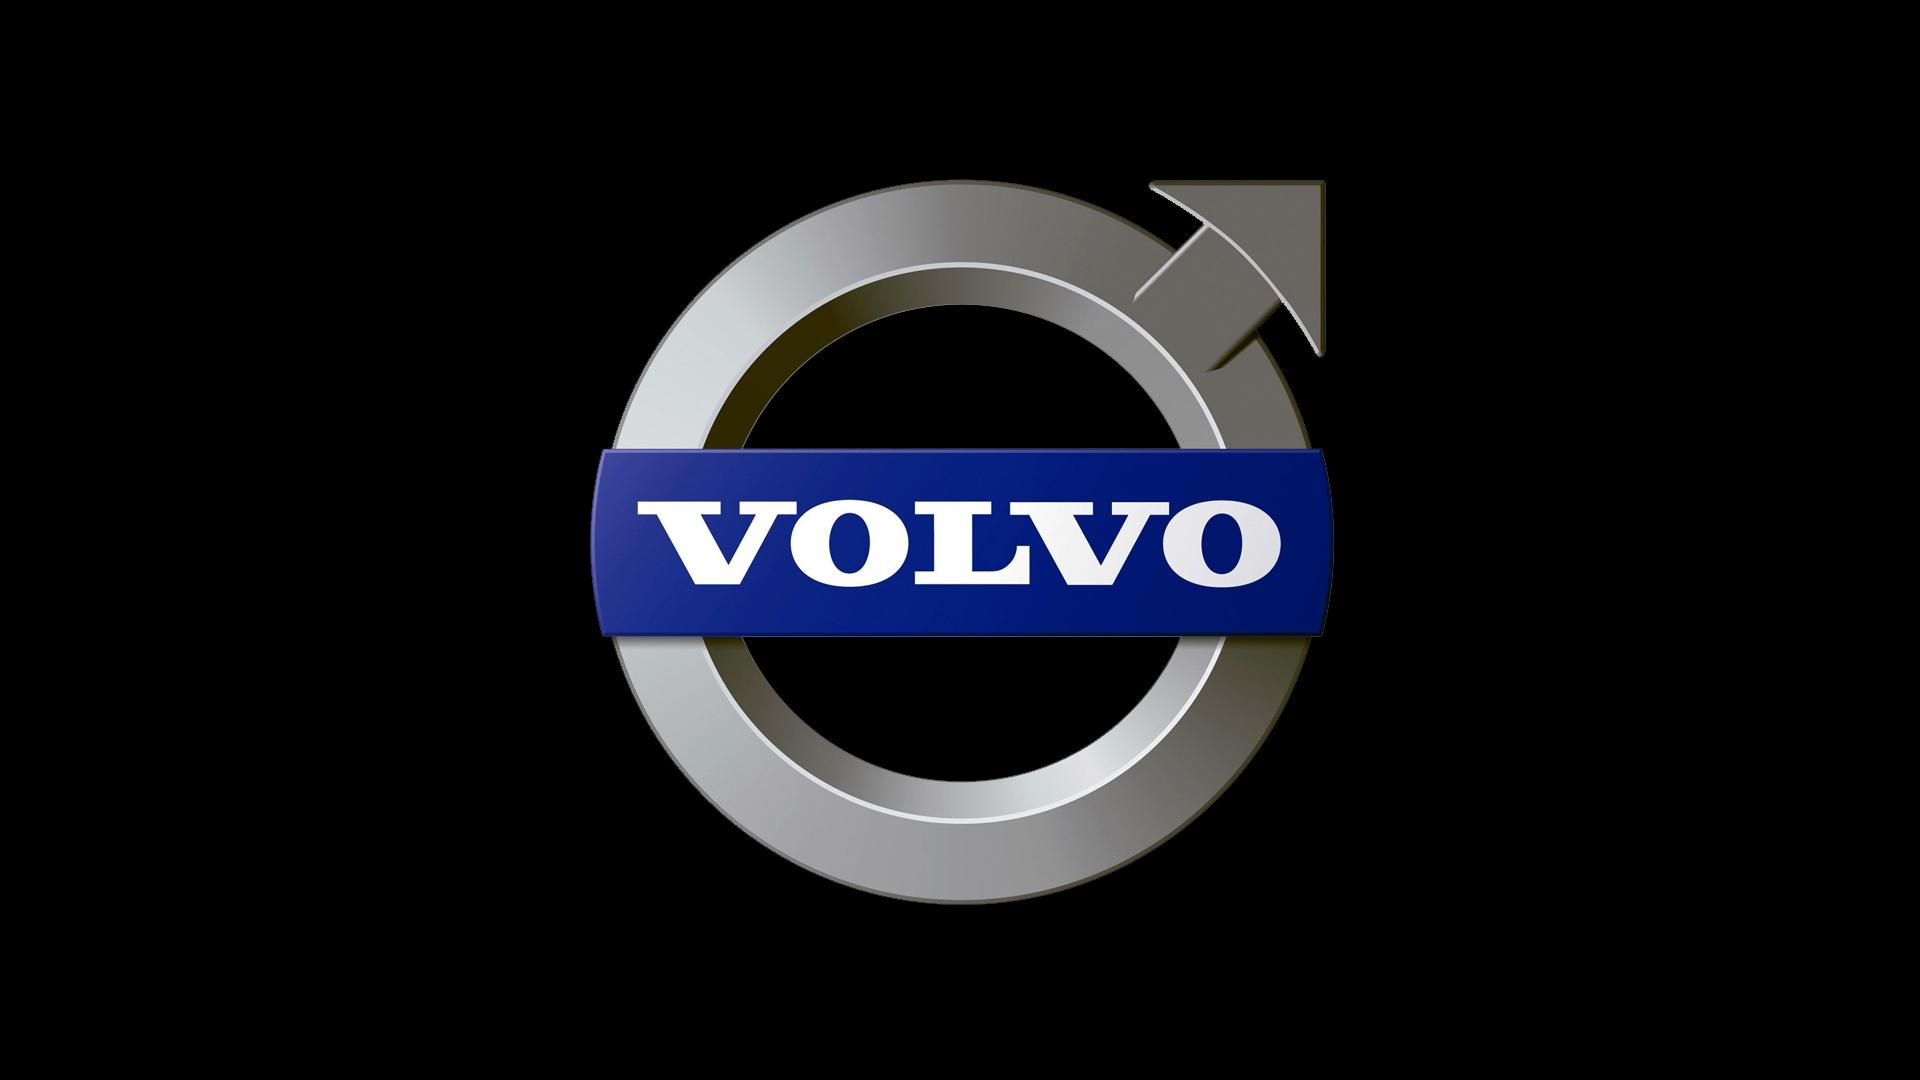 volvo logo wallpaper 59098